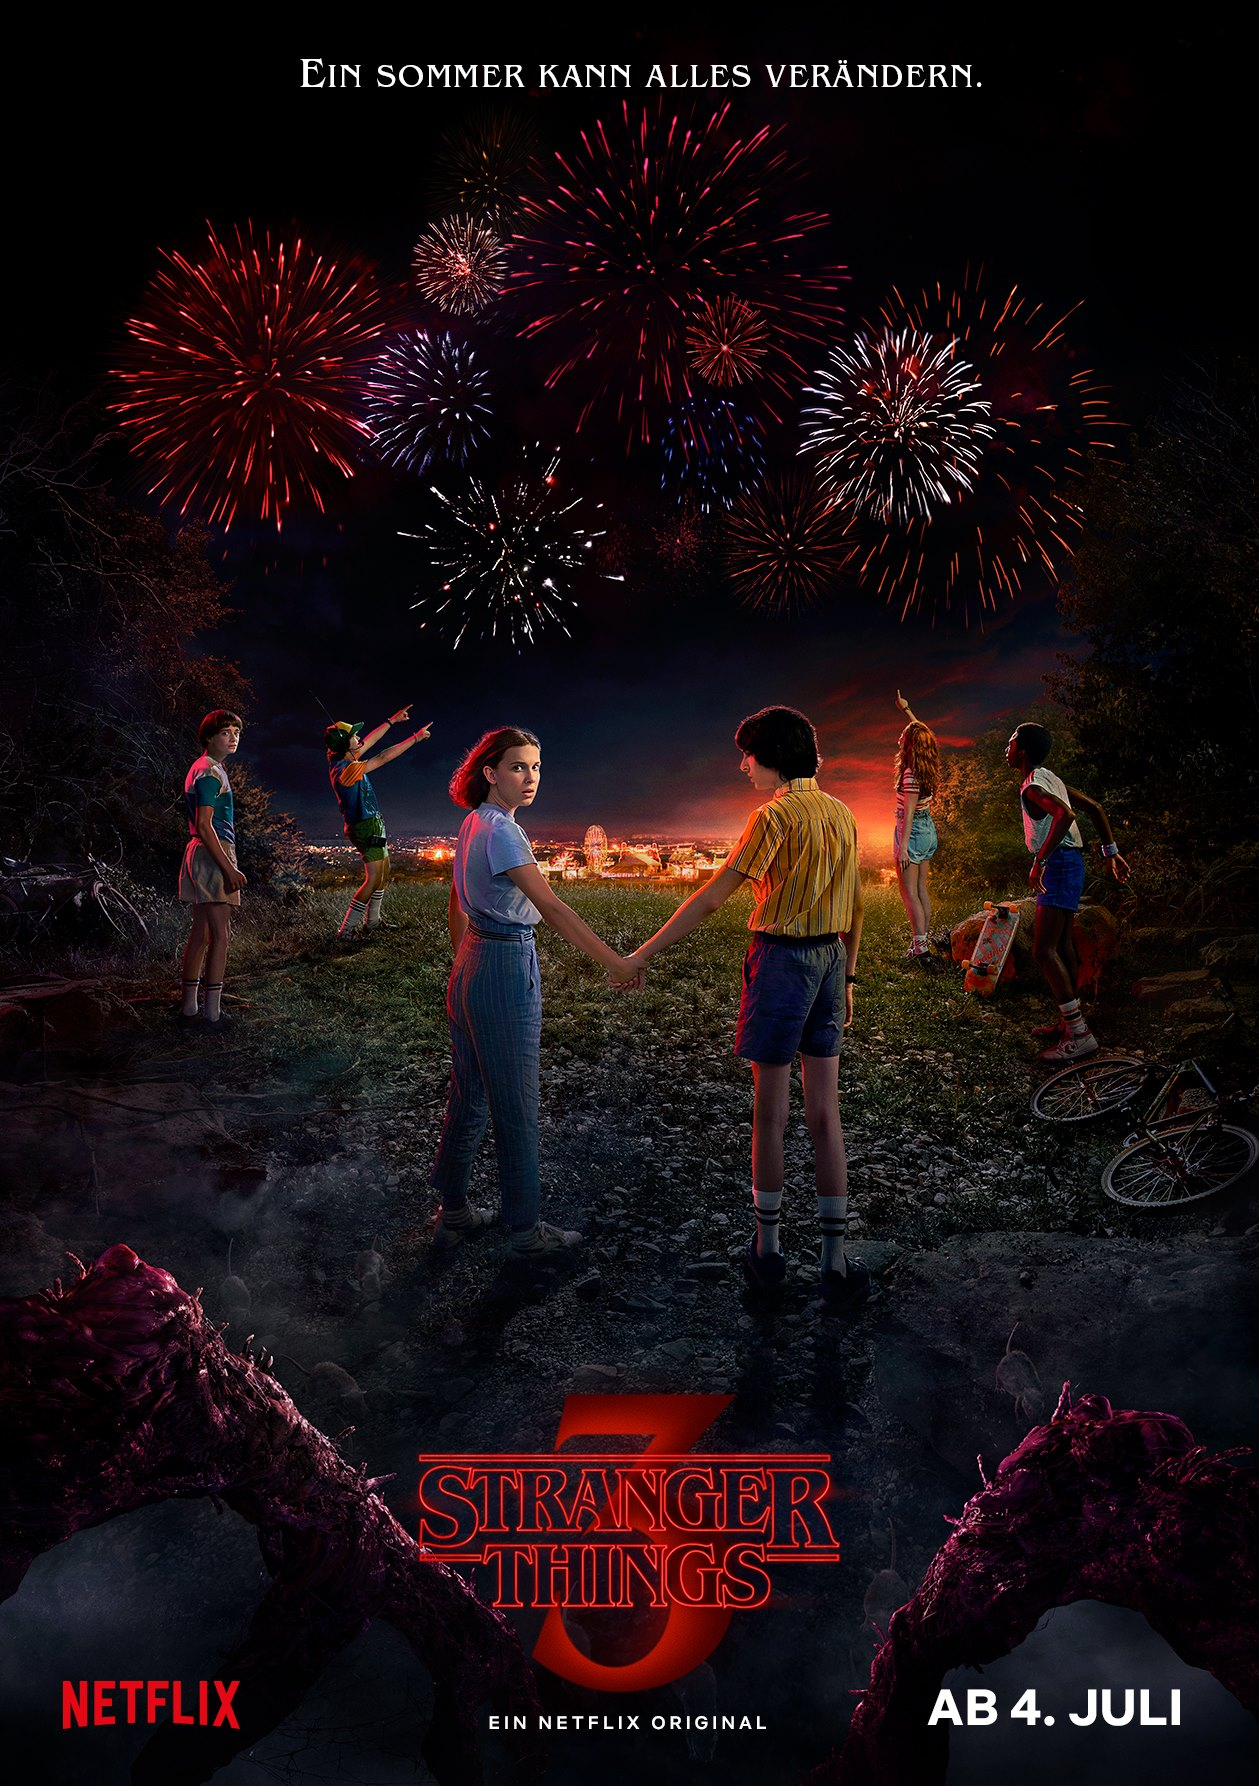 Starttermin Zu Stranger Things 3 Steht Fest Scary Movies De